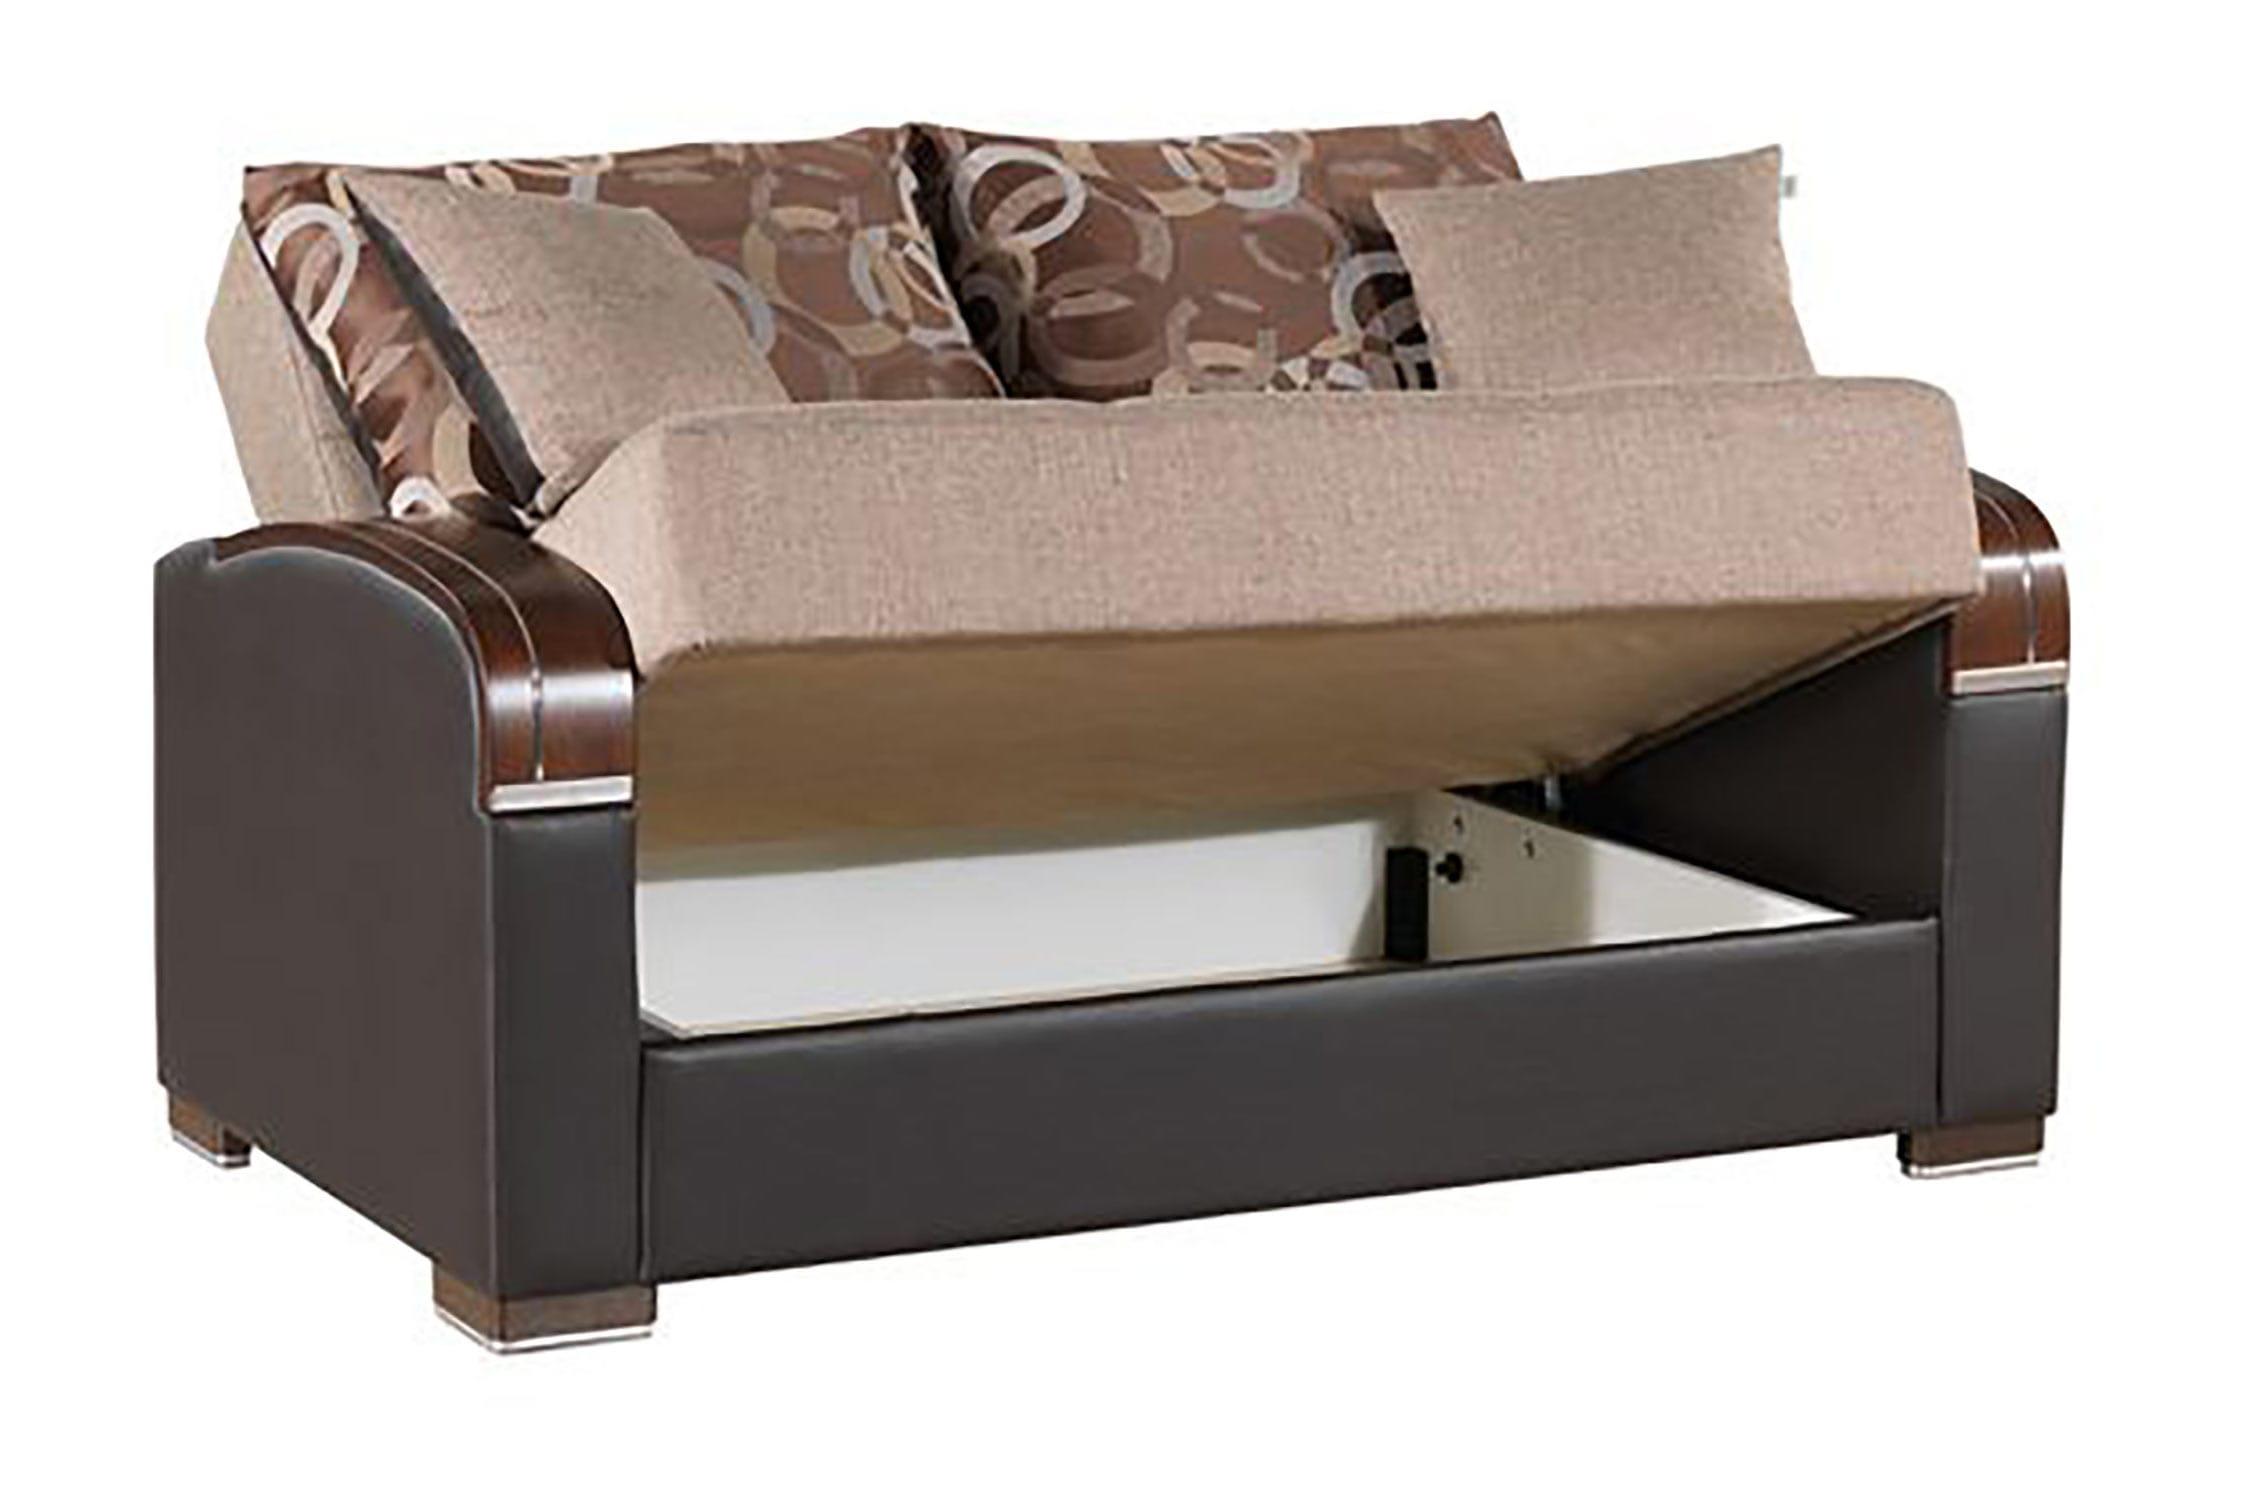 Brilliant Mobimax Brown Loveseat By Casamode Inzonedesignstudio Interior Chair Design Inzonedesignstudiocom